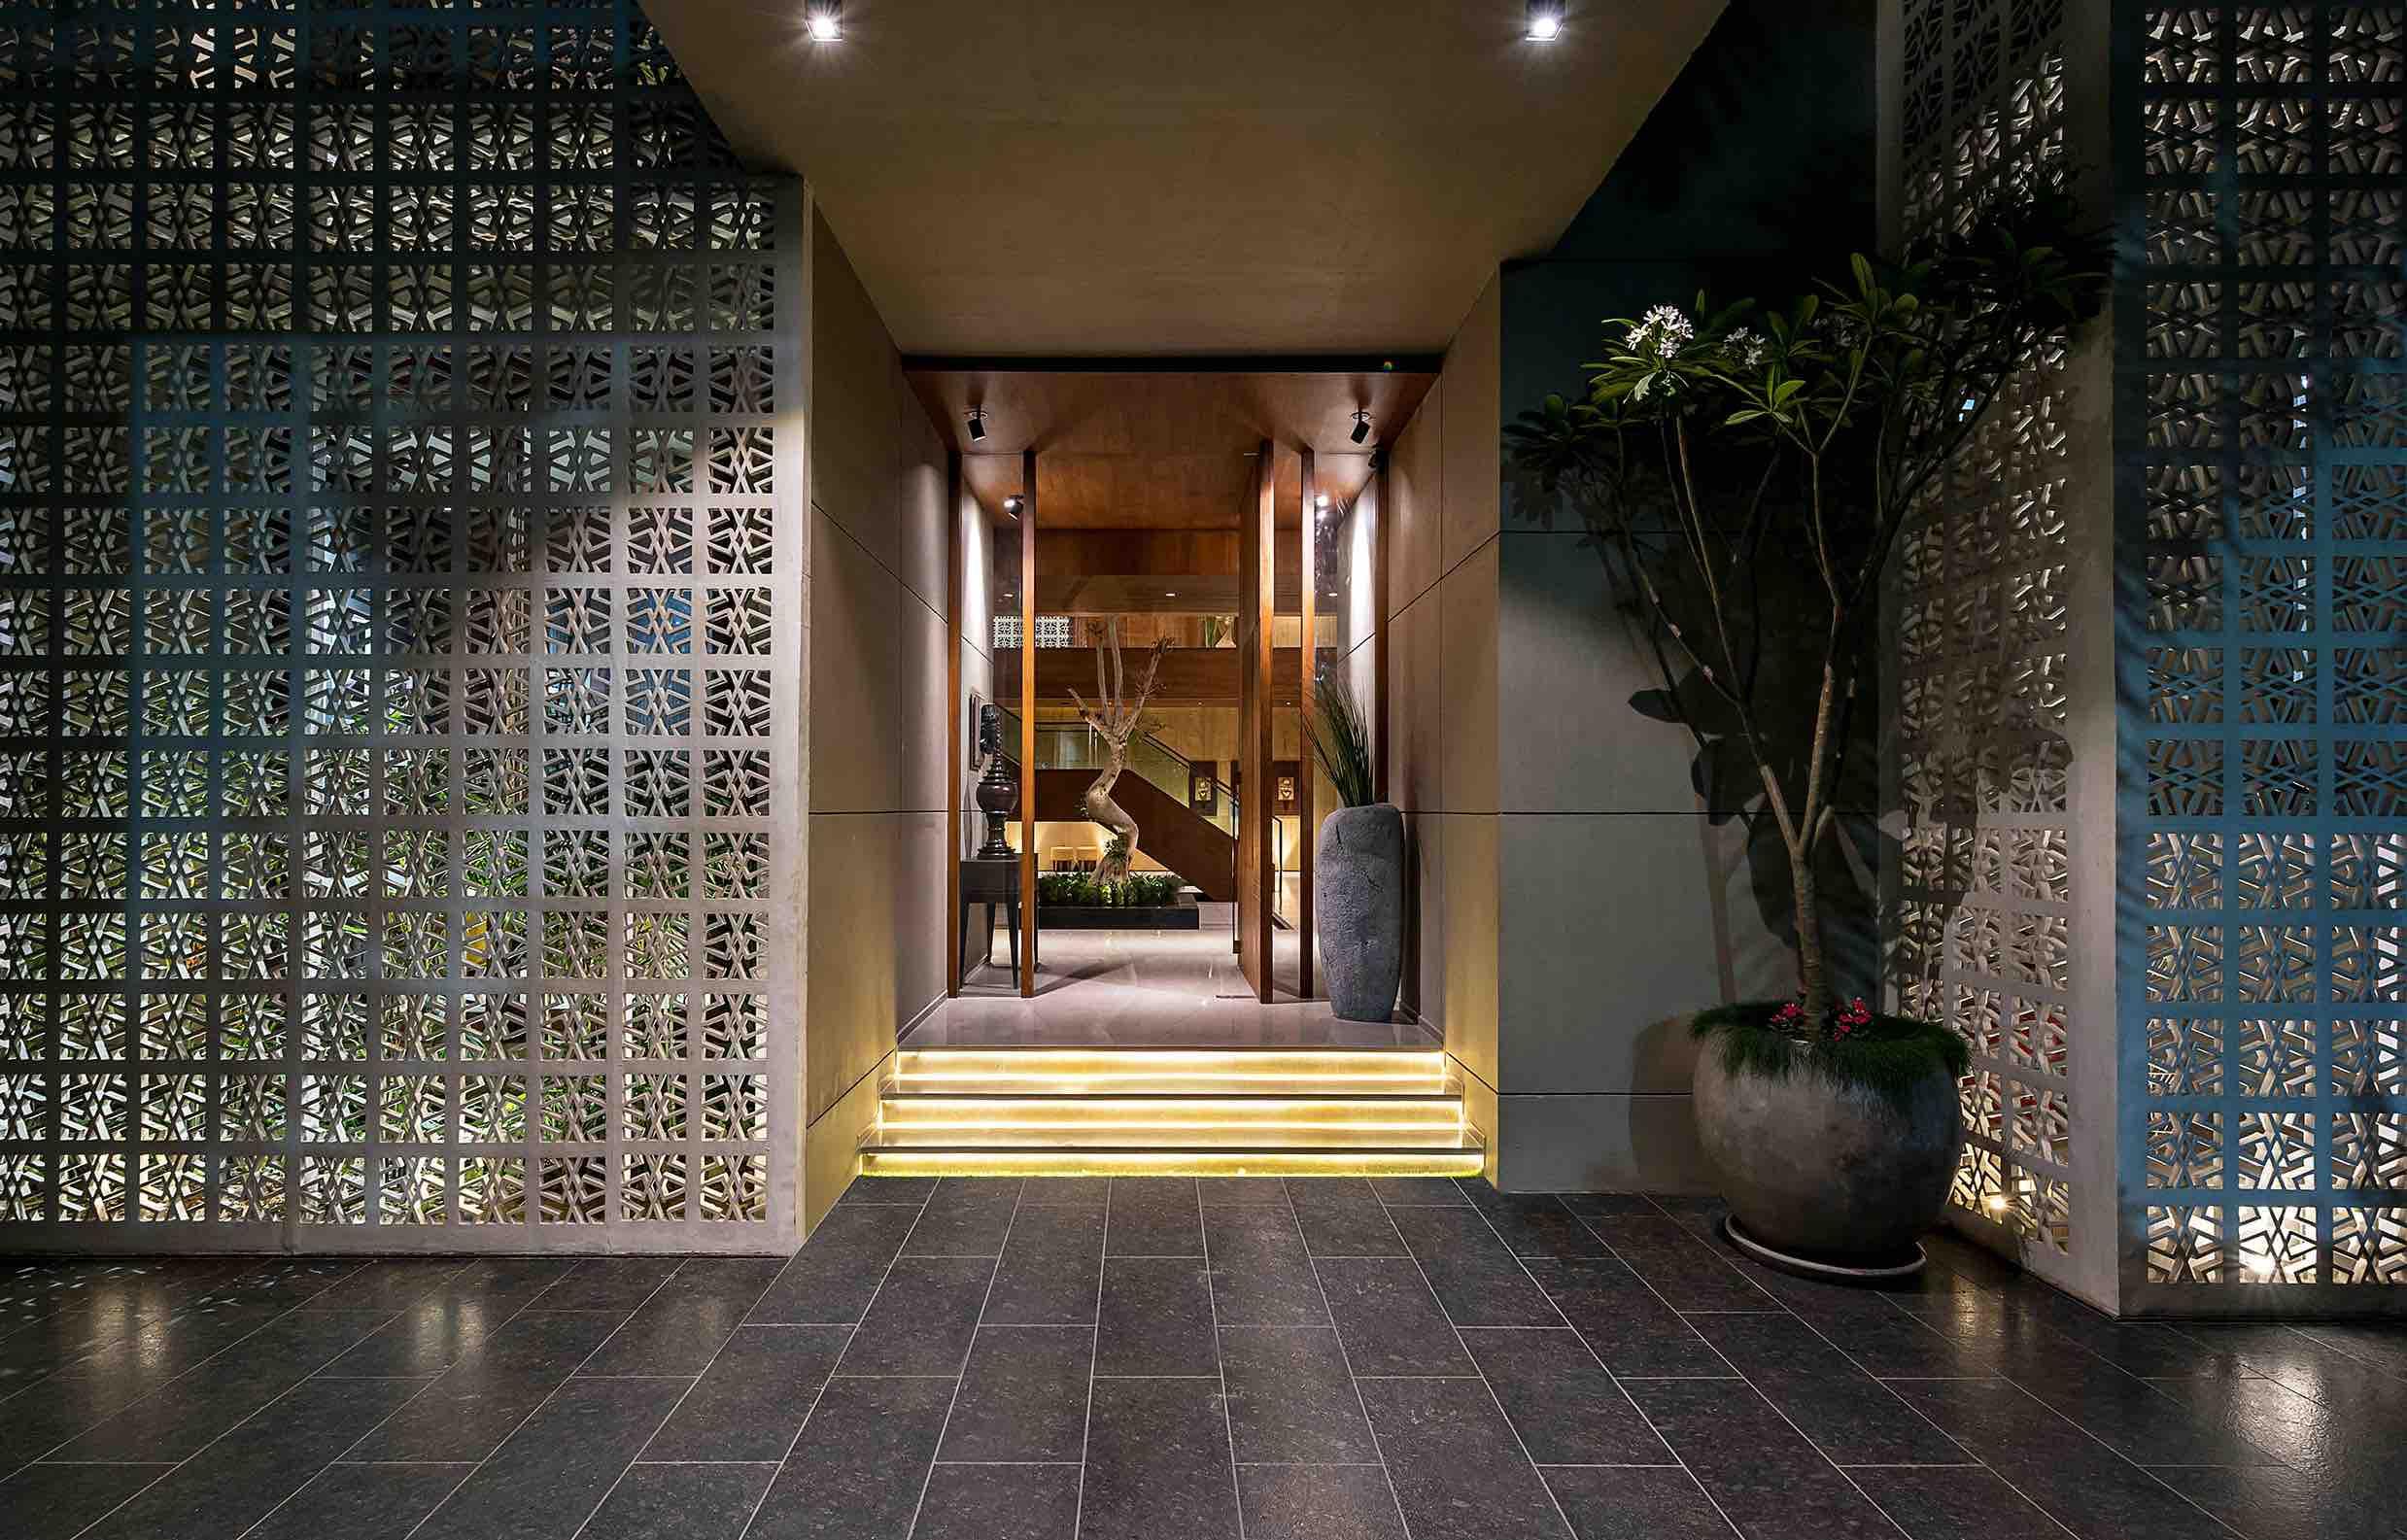 18_Screens_Sanjay_Puri_architects_india_amazingarchitecture_023.jpg